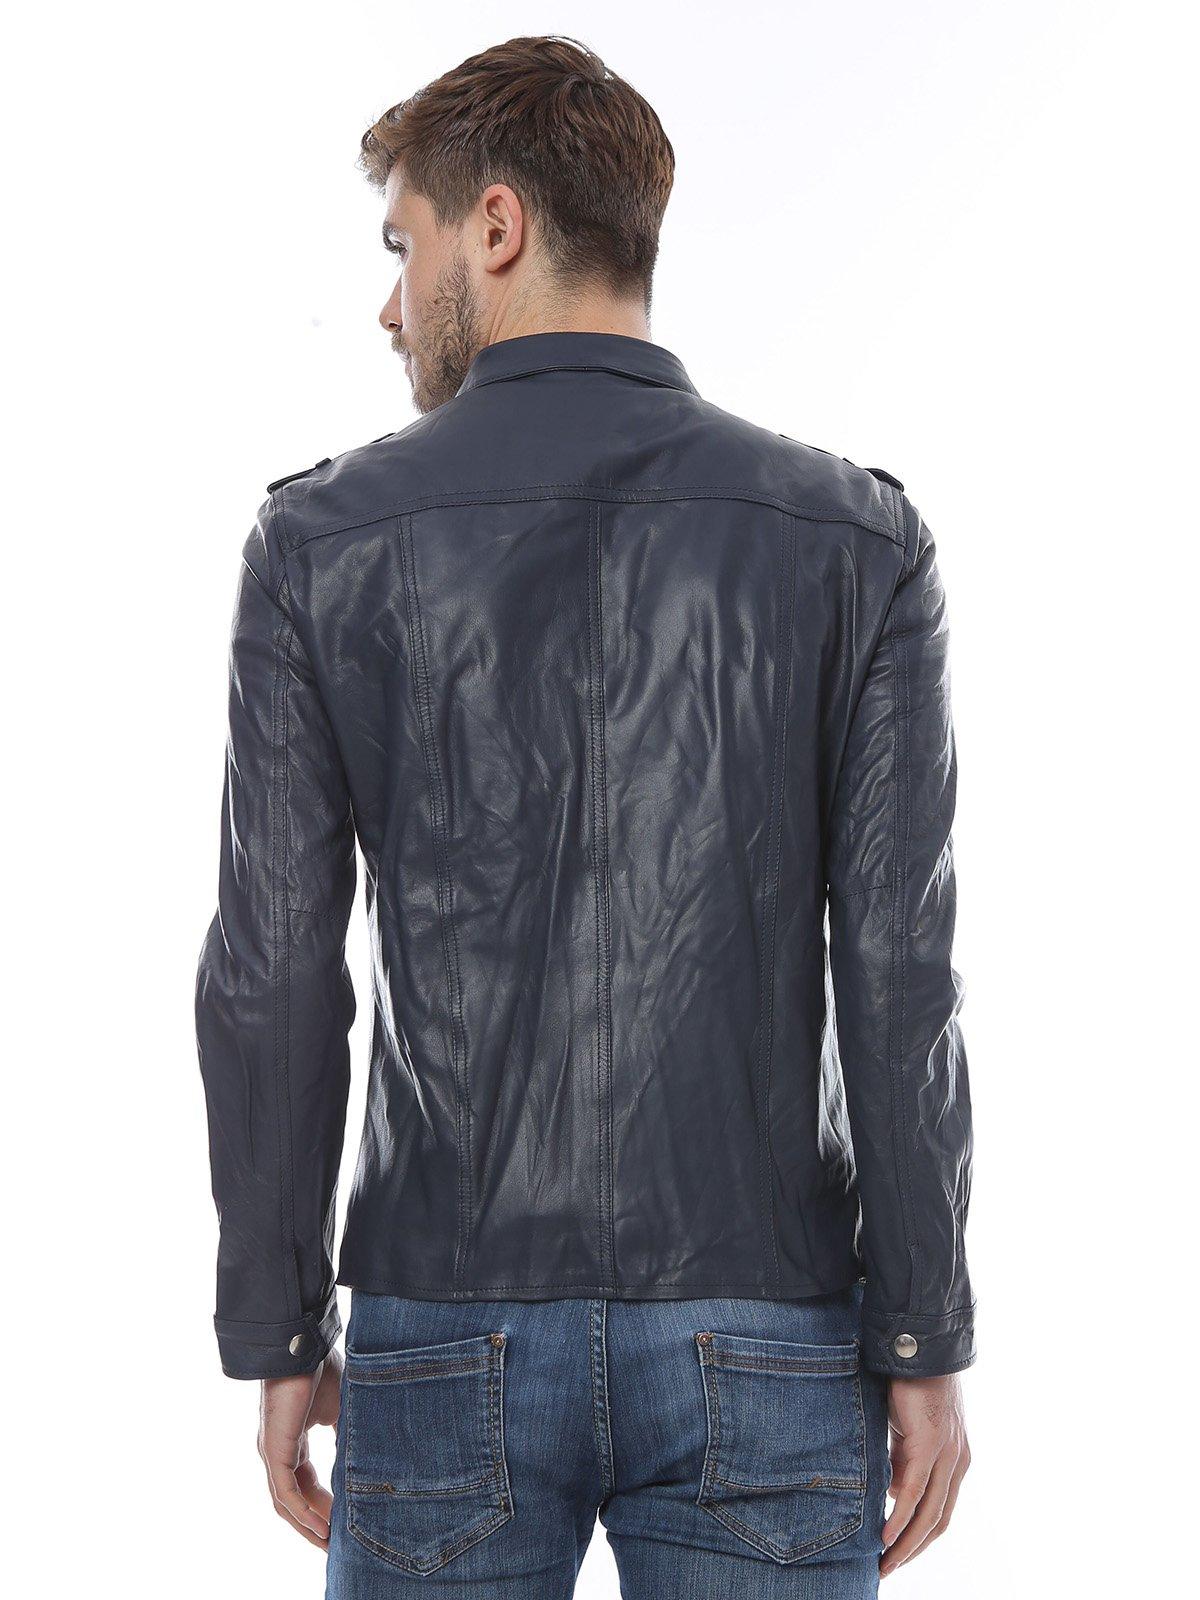 Куртка темно-синяя | 3010785 | фото 2